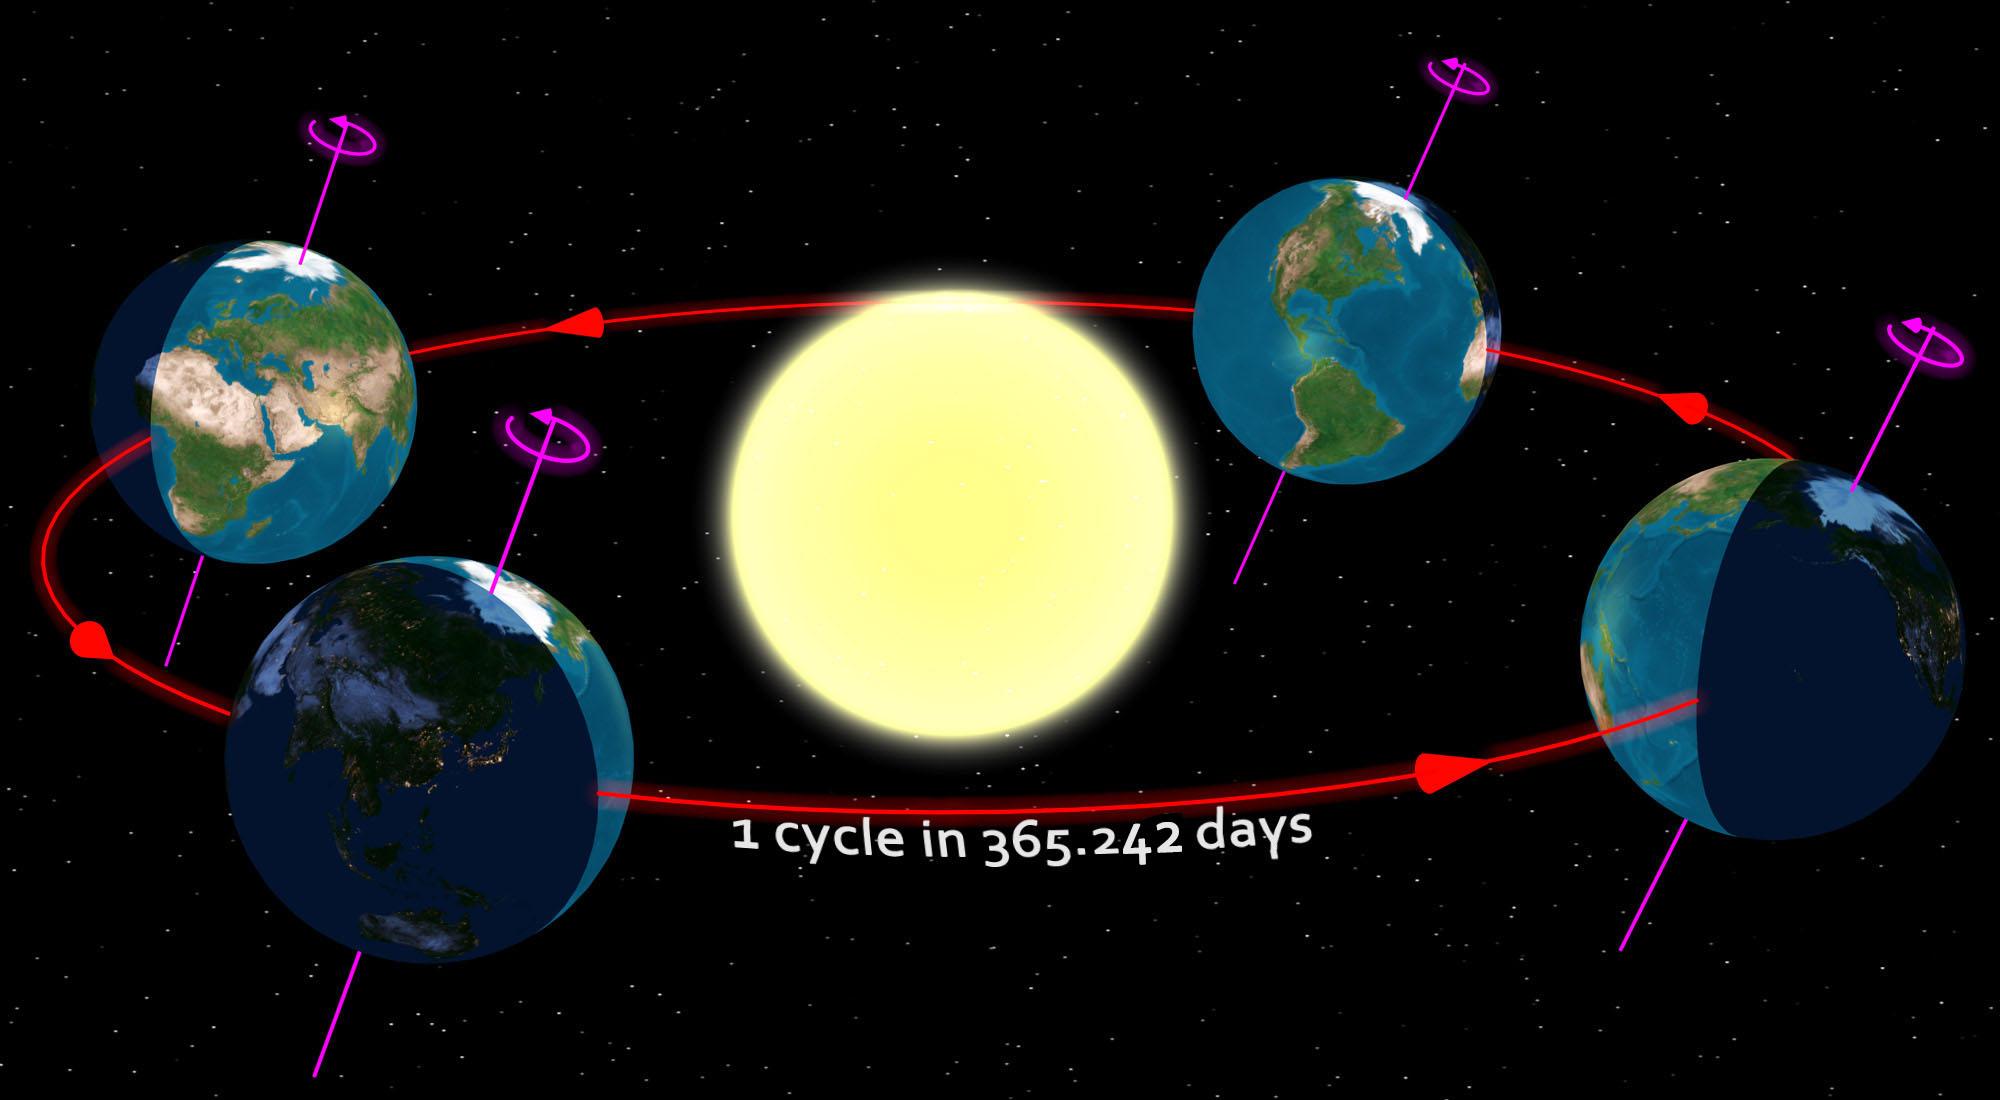 Earth revolution cycle around sun